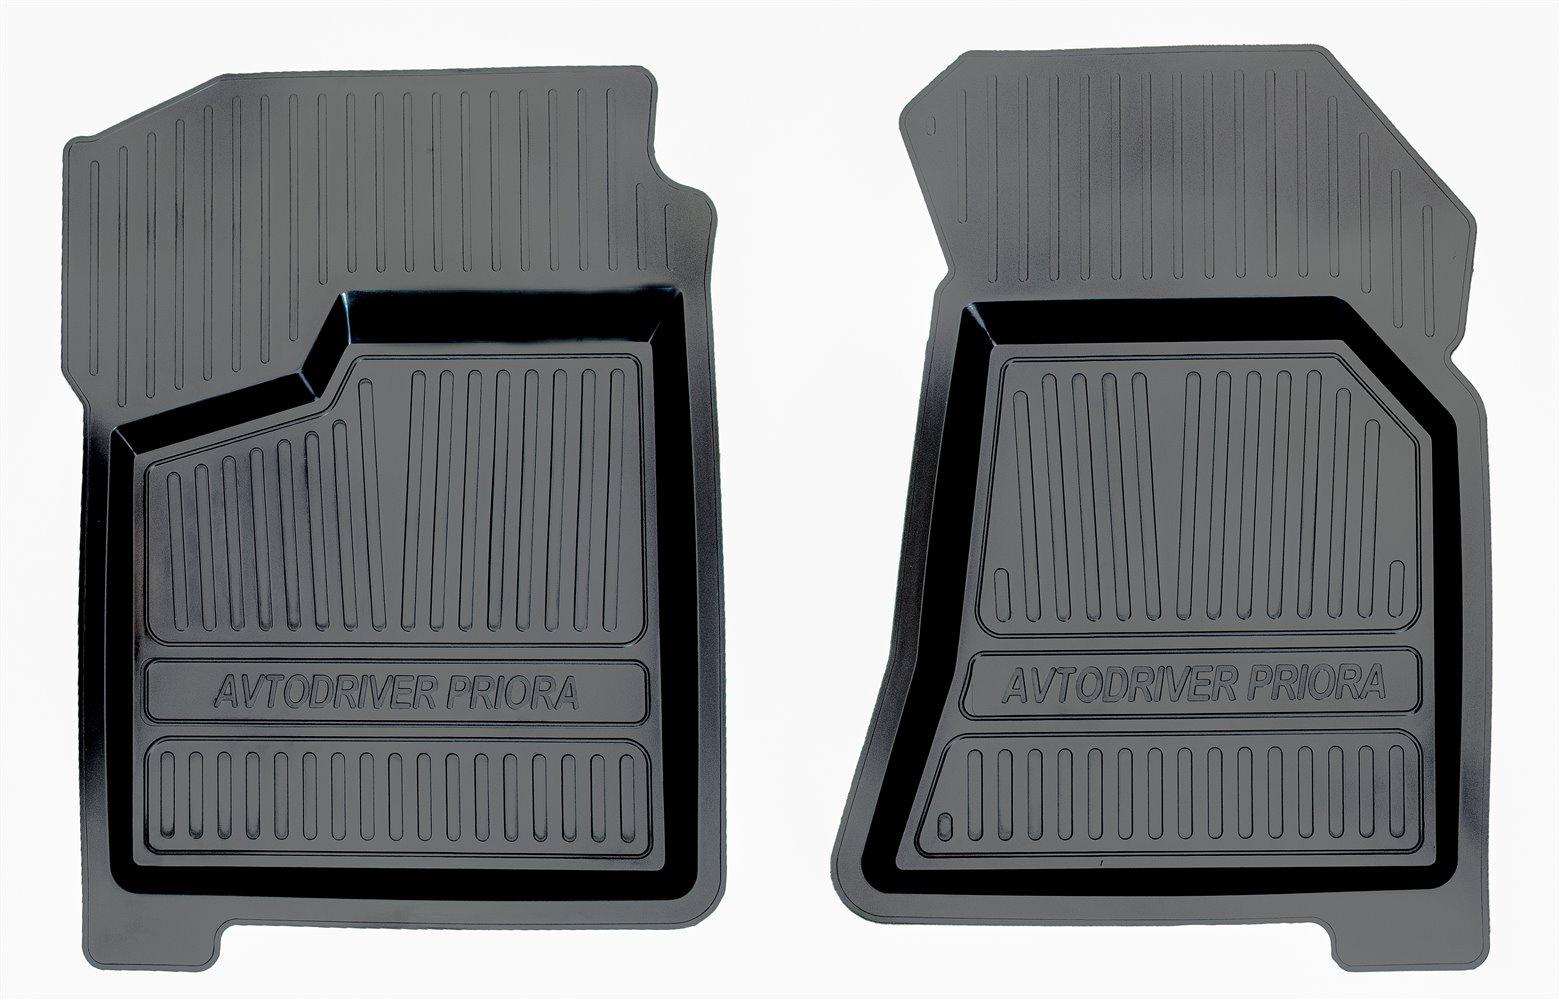 Коврики в салон автомобиля Avtodriver, для ВАЗ Приора, 2007-, 2 передних, ADRJET007-2, резиновые, с бортиком, черный коврики в салон автомобиля avtodriver для toyota highlander 2007 2014 adravg162 резиновые с бортиком черный